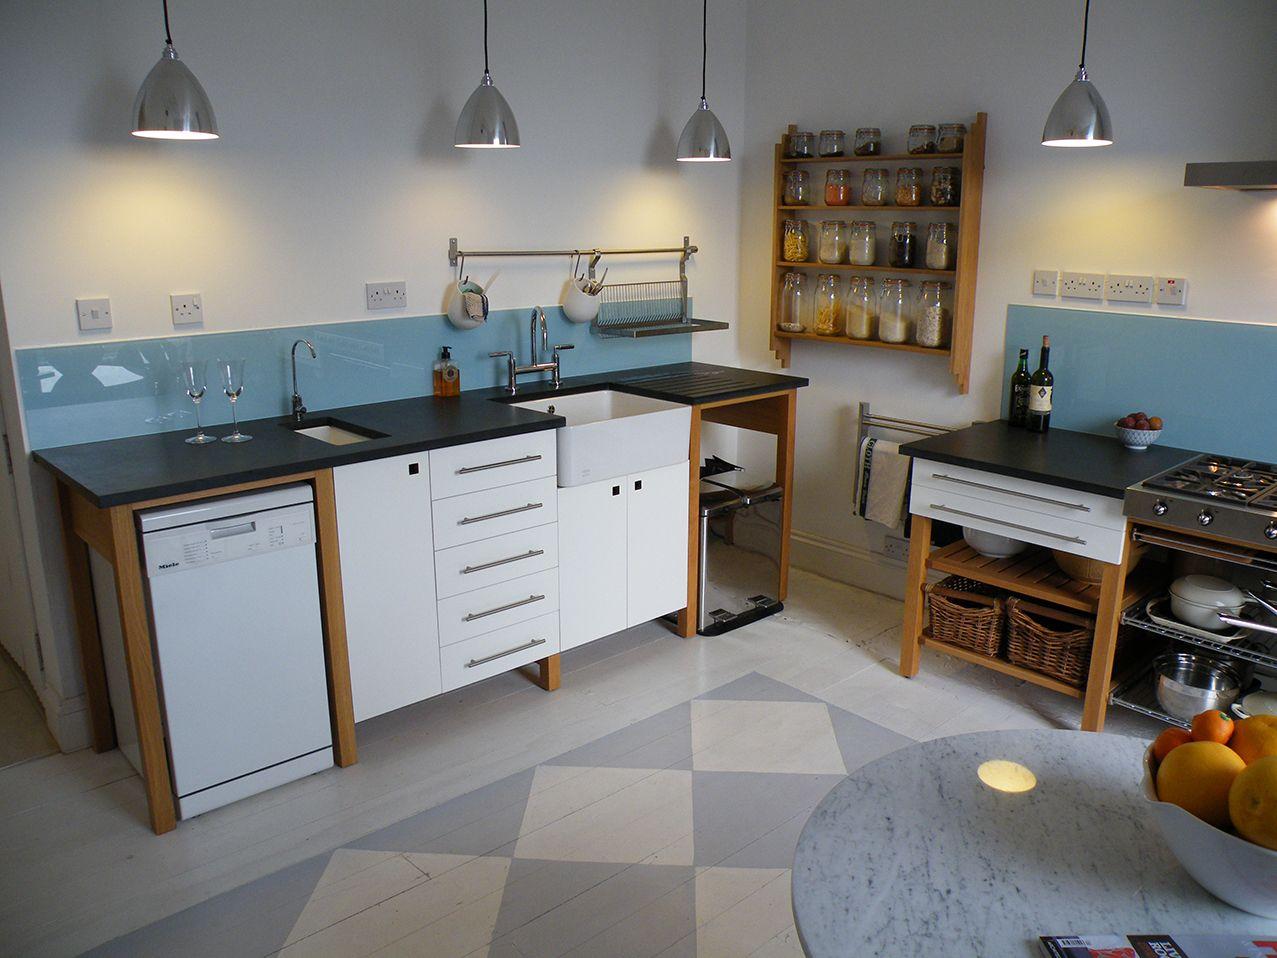 Uncategorized. Kitchen Appliances Edinburgh. wingsioskins ...